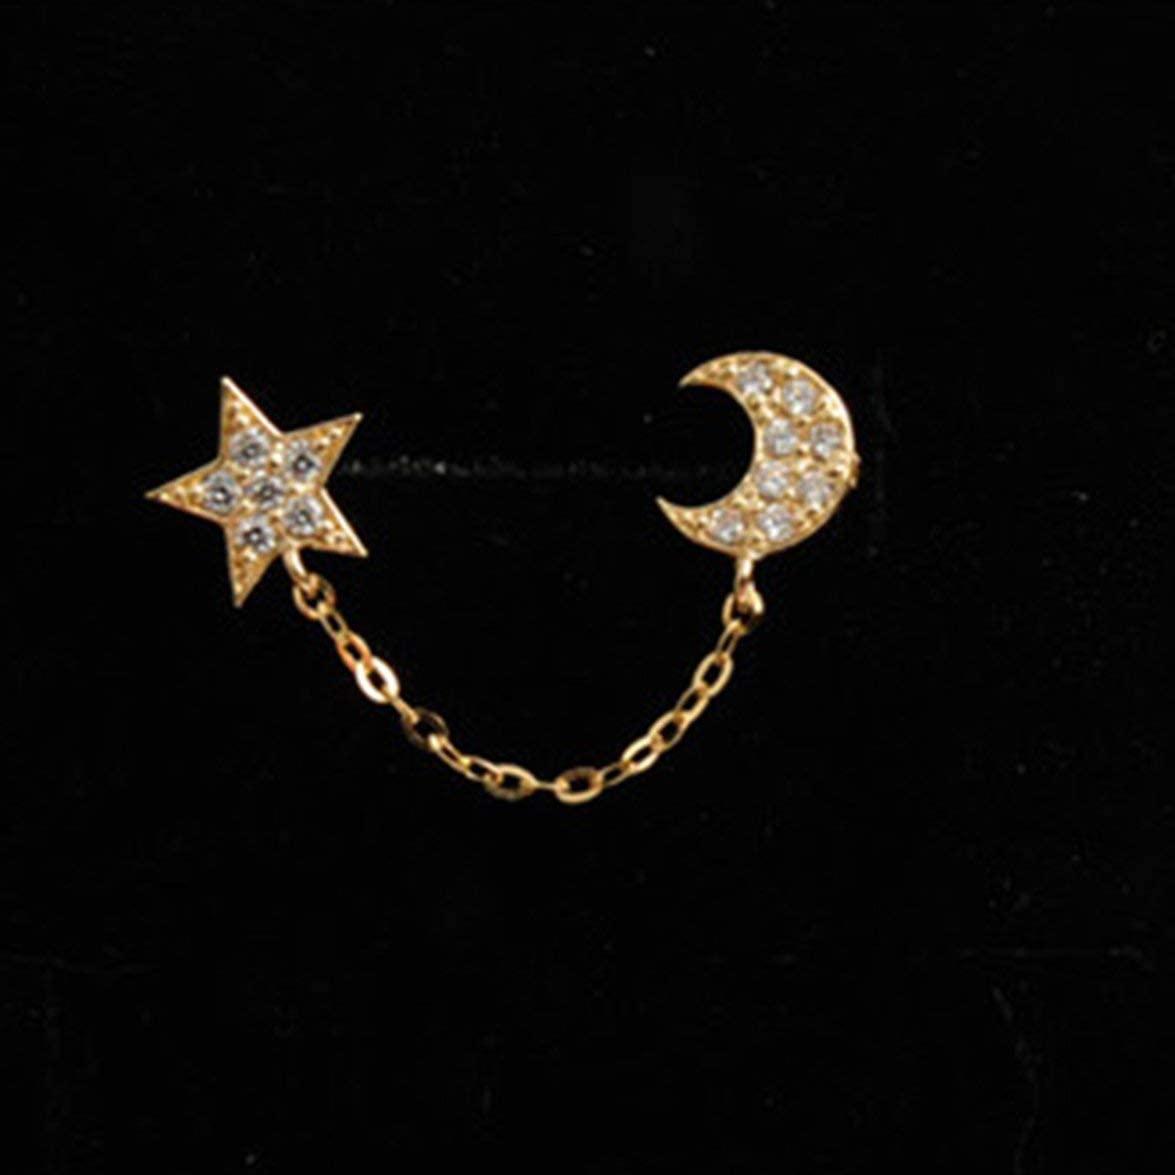 Sylvialuca Star Moon Diamond Refinement Fashion Stud Earrings Ear Hoop Jewelry Ear Decoration for Women Party Casual Ear Accessories